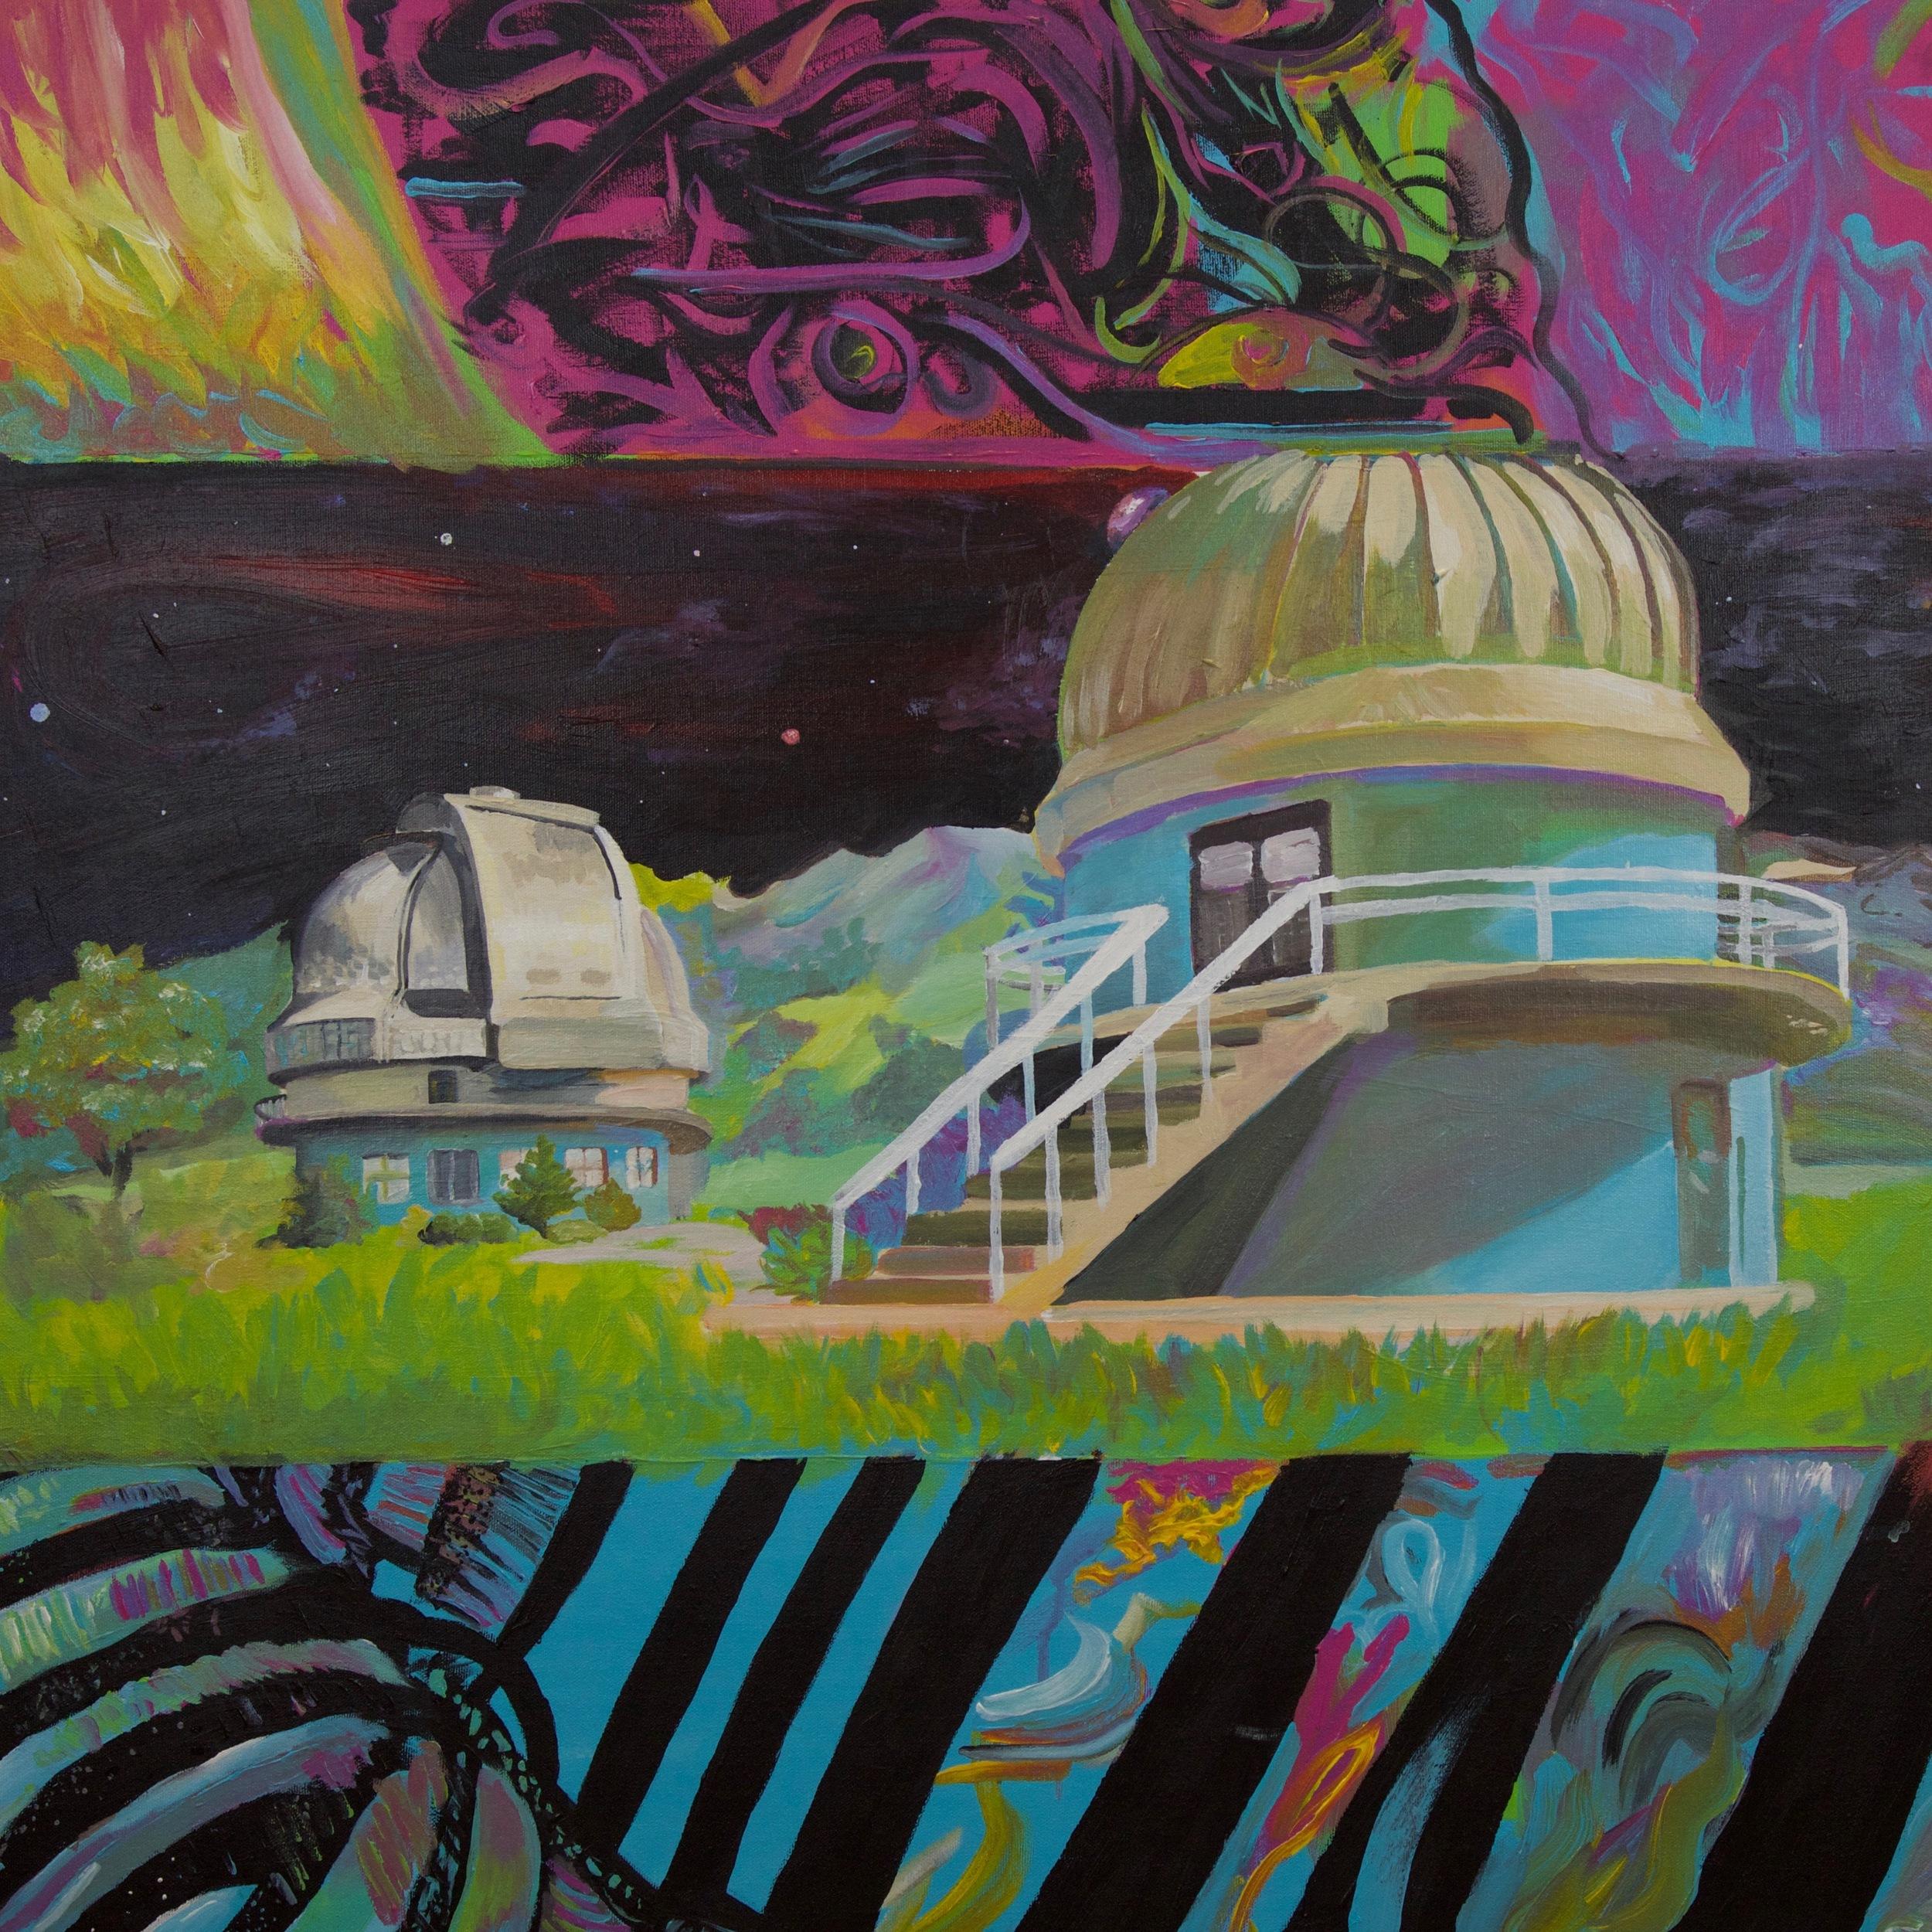 Observation of Creation